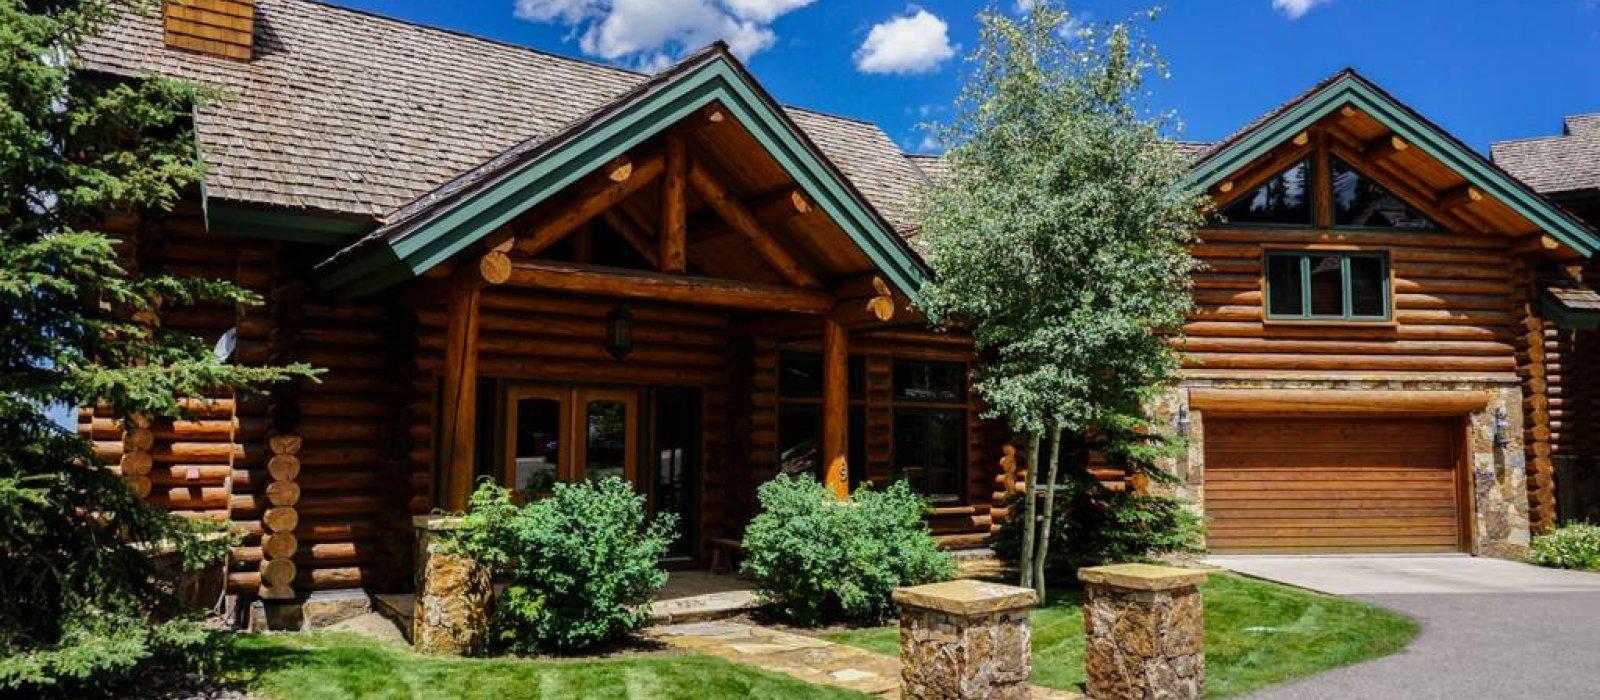 Telluride Sundance Home Telluride Vacation Villa